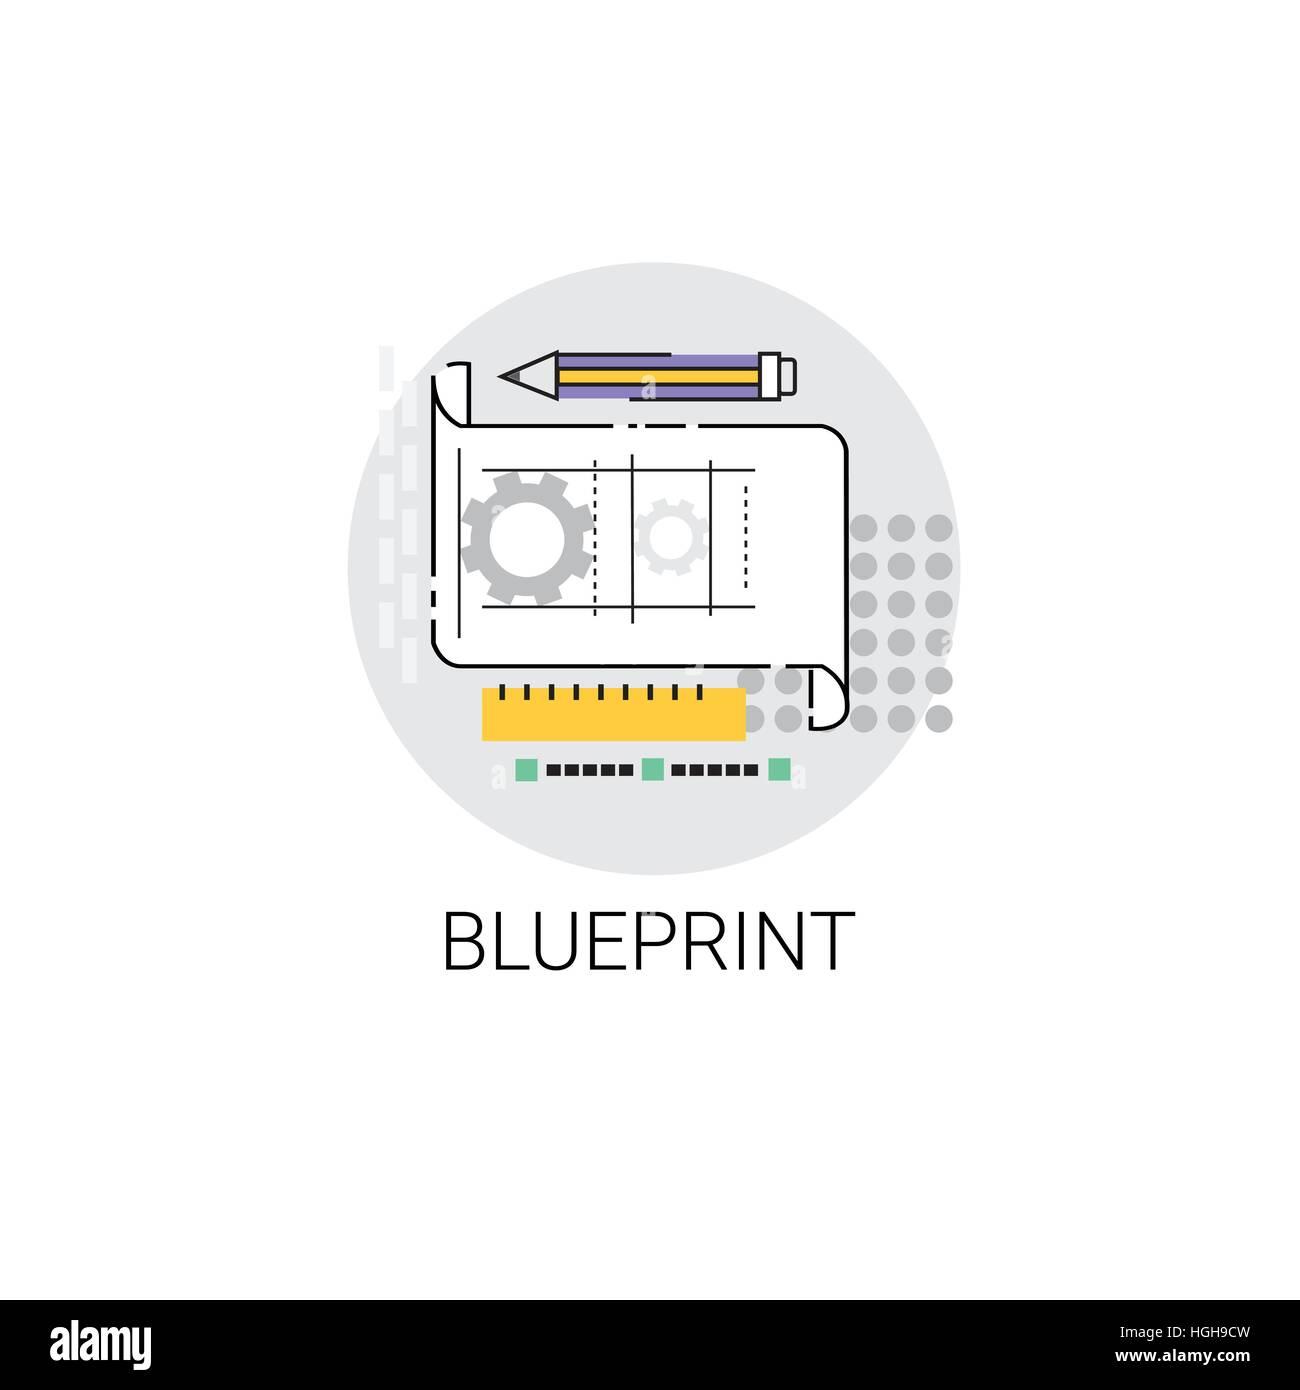 Blueprint architecture design development icon stock vector art blueprint architecture design development icon malvernweather Images